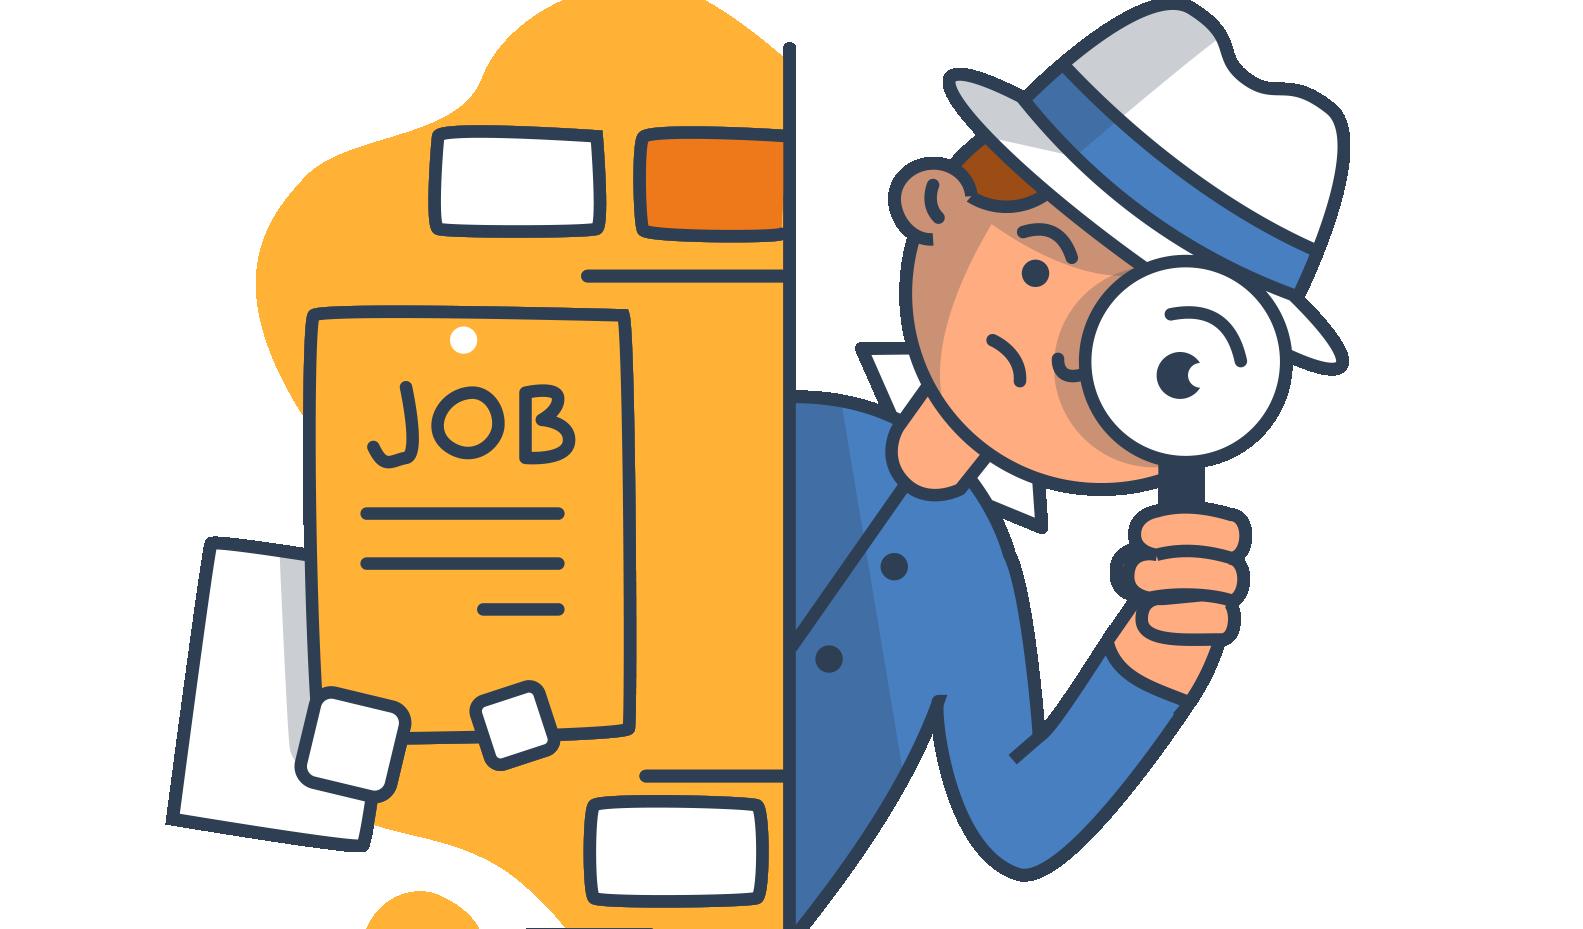 Find a remote job Sales, marketing, Find a job, Writing